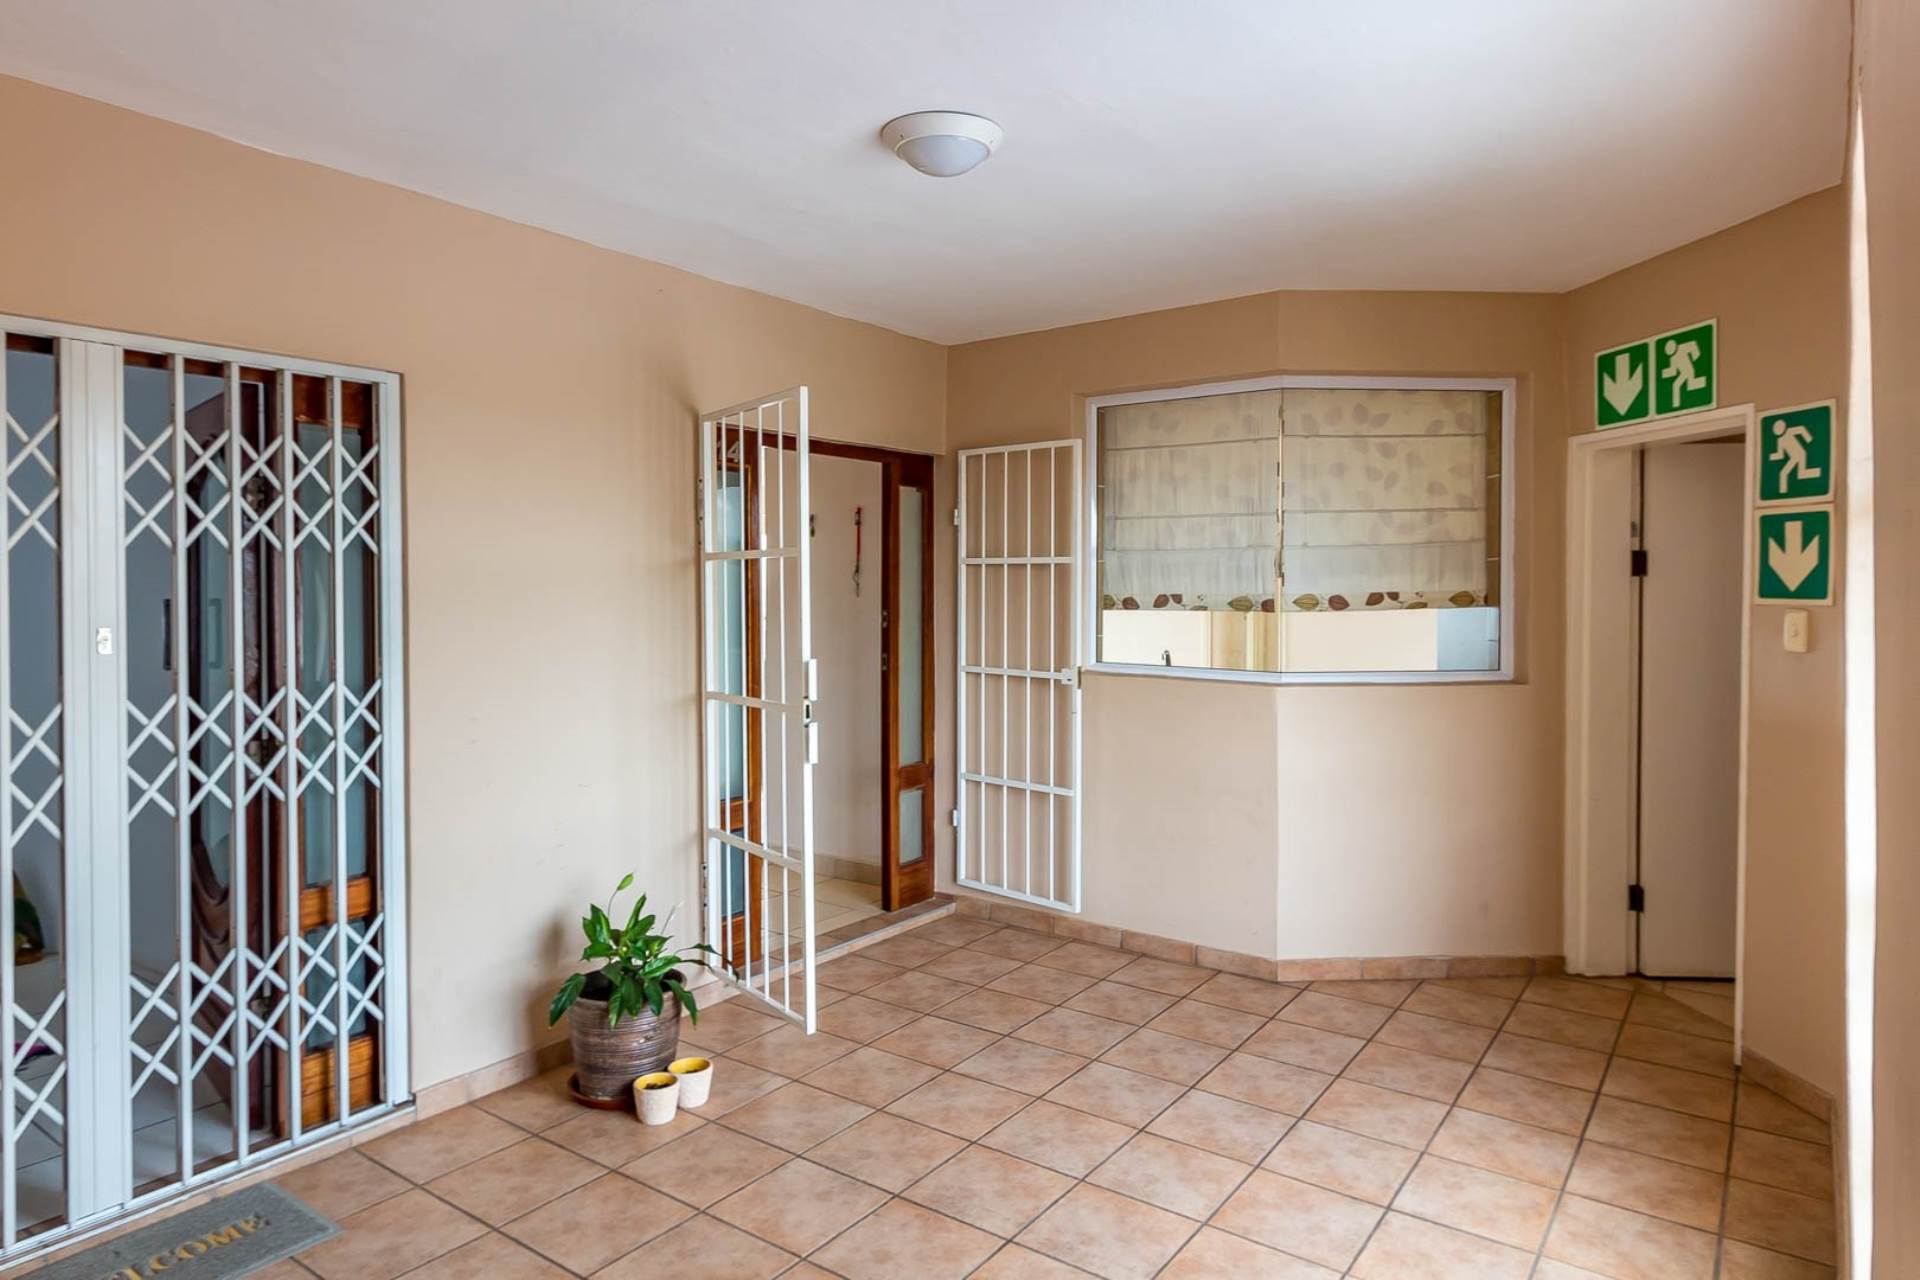 3 BedroomApartment For Sale In Amanzimtoti